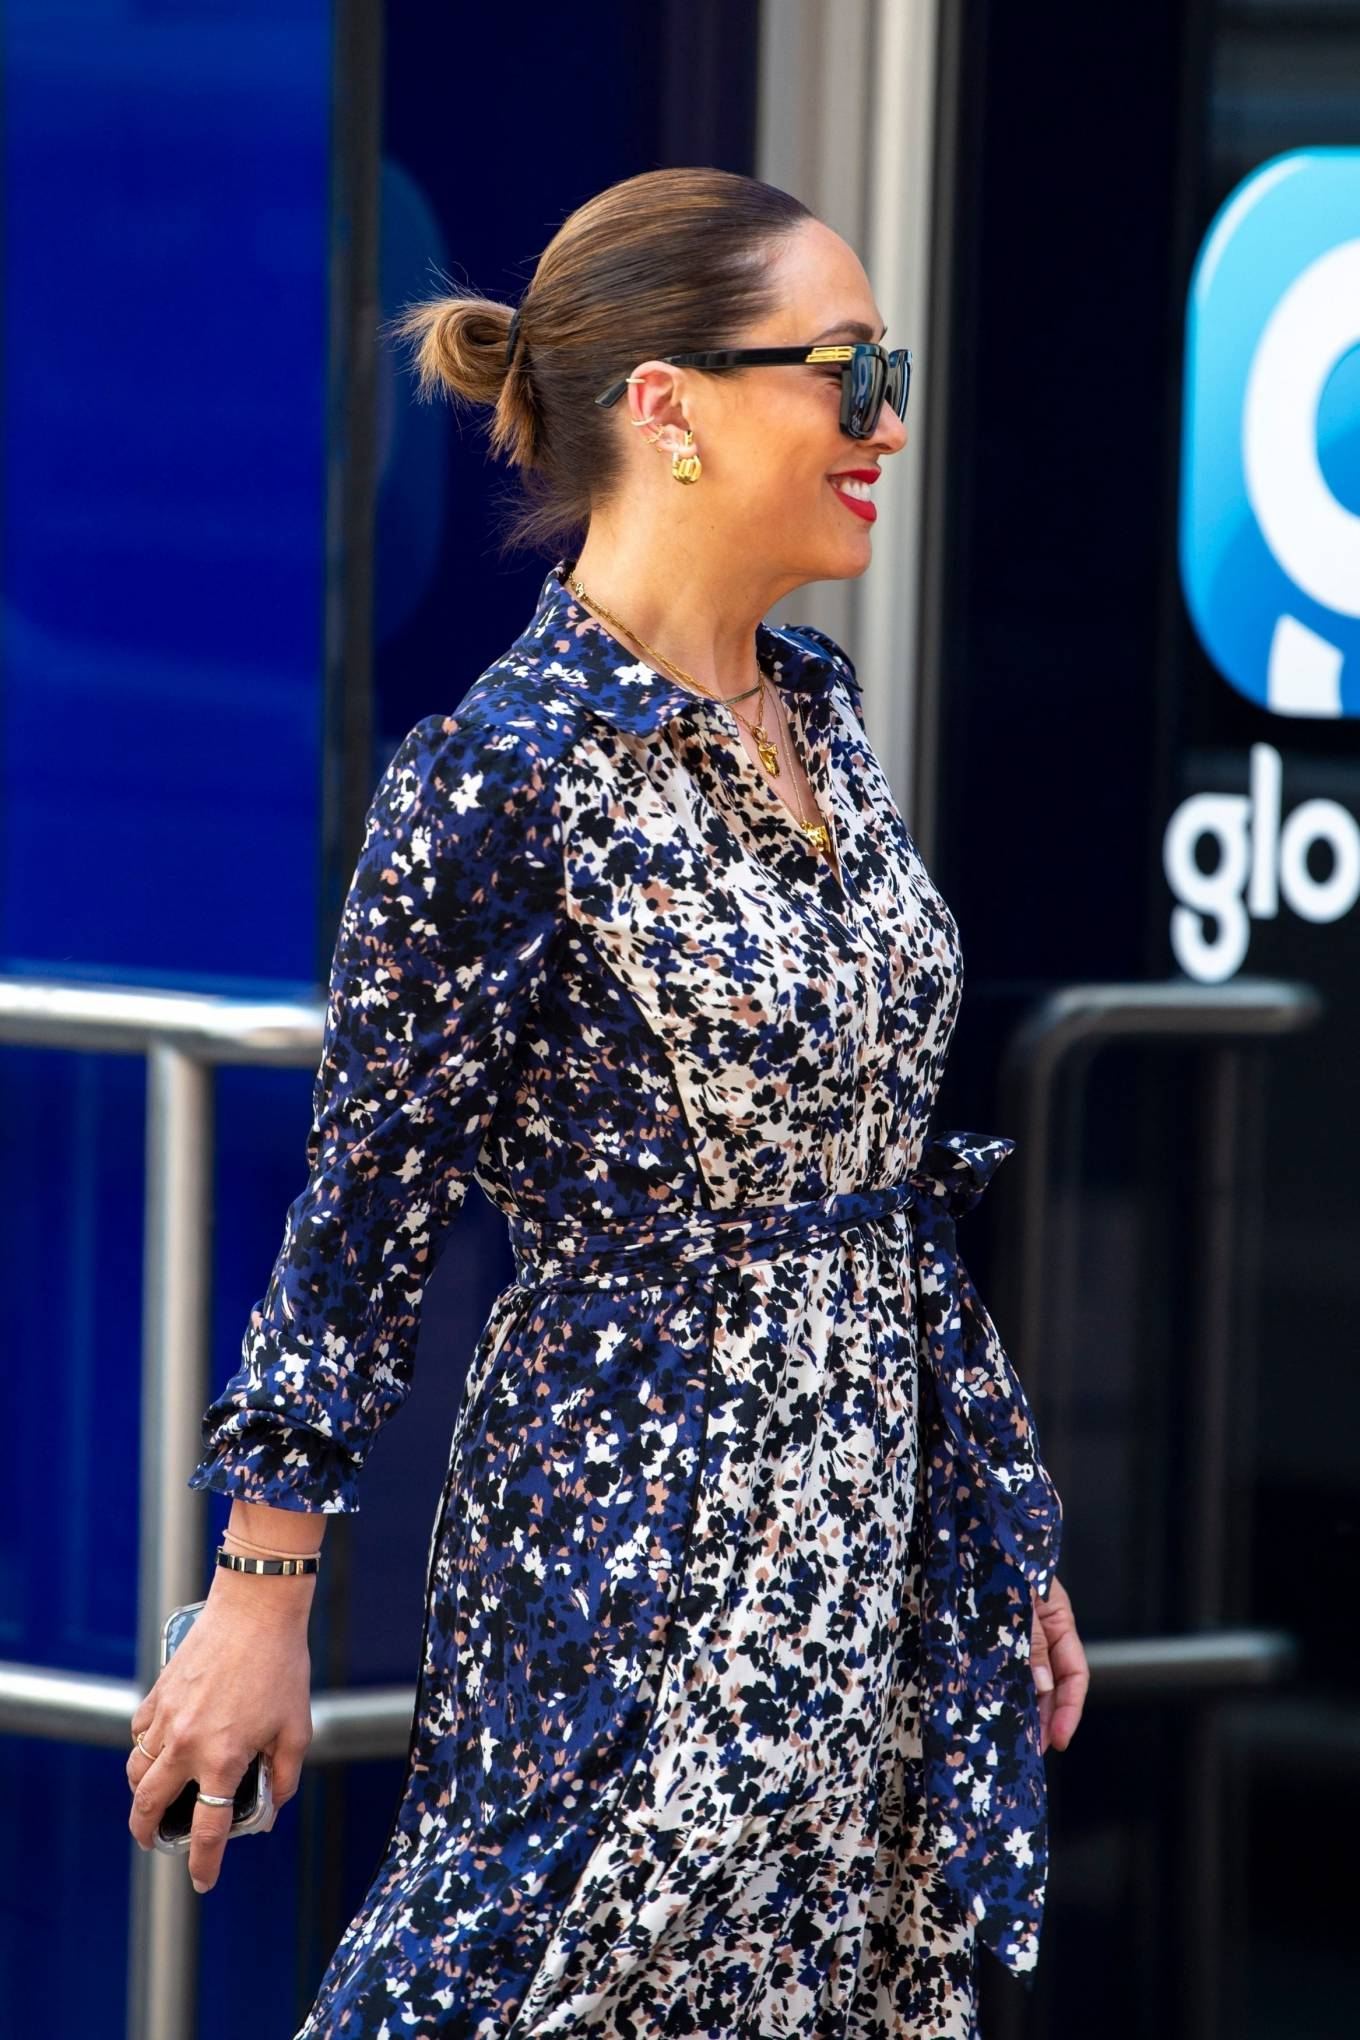 Myleene Klass 2021 : Myleene Klass – In a long summer dress arriving at the Global studios -07